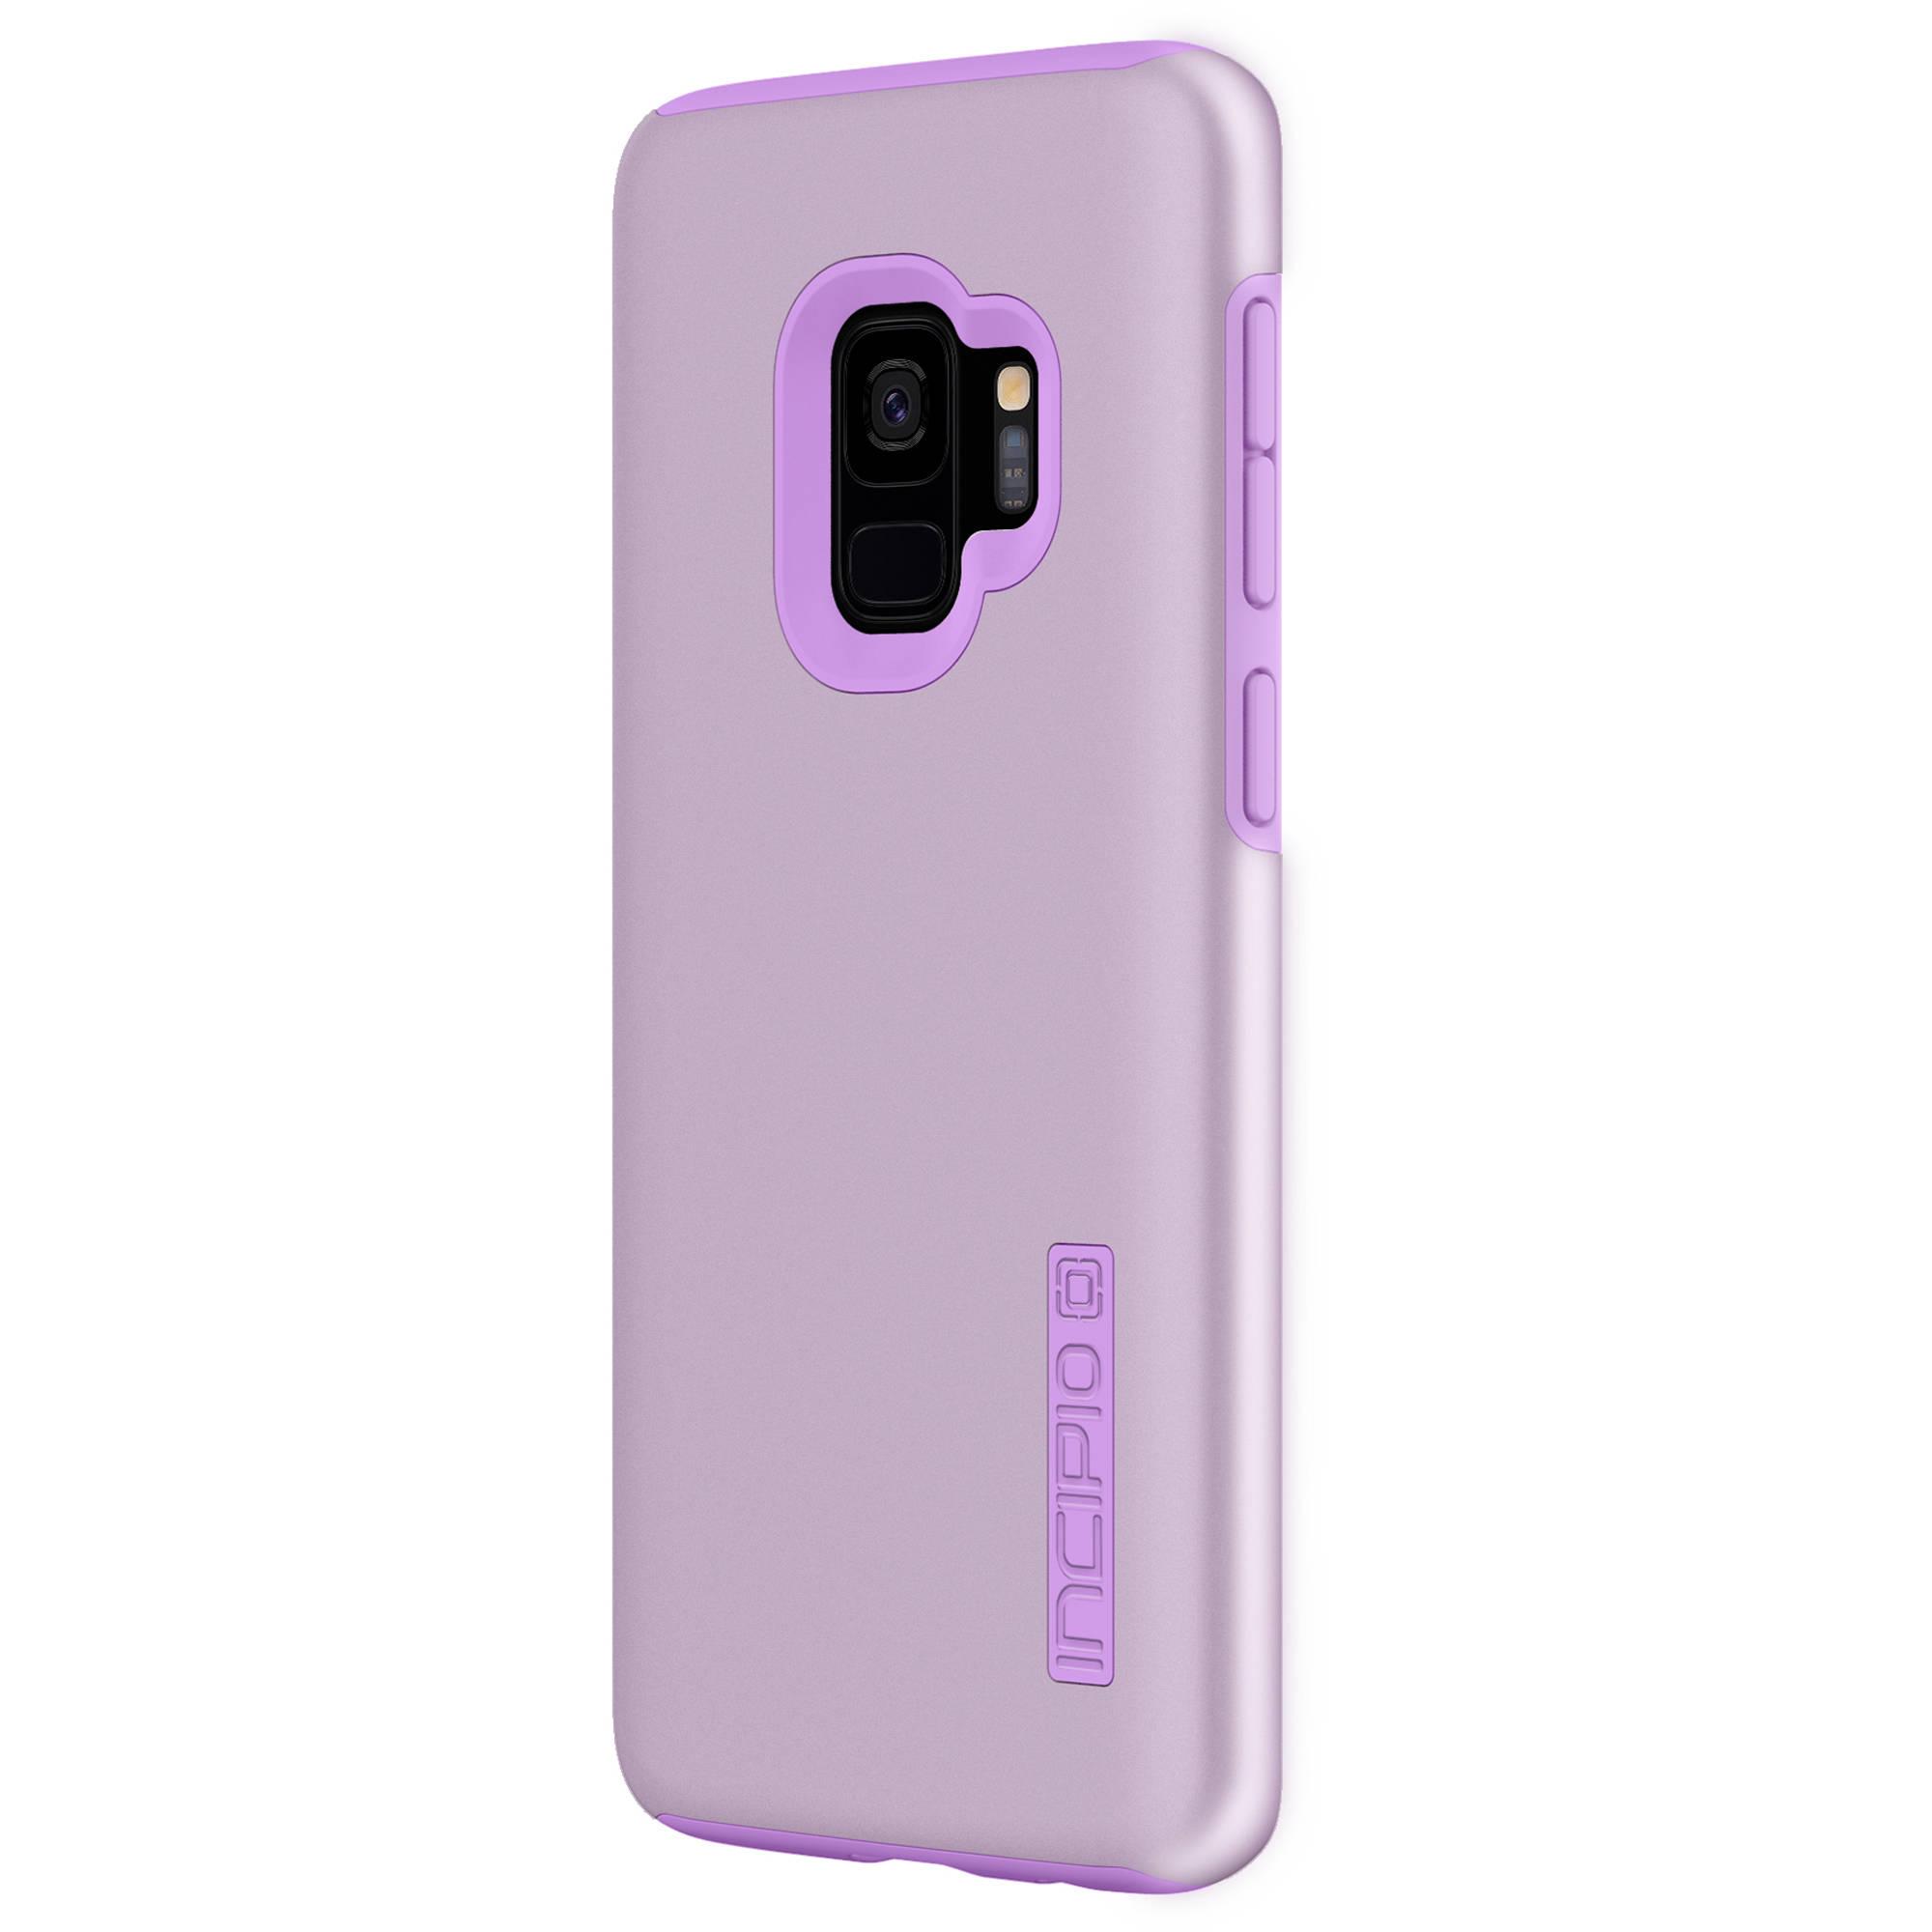 purchase cheap a250a d0917 Incipio DualPro Case for Galaxy S9 (Iridescent Lilac)